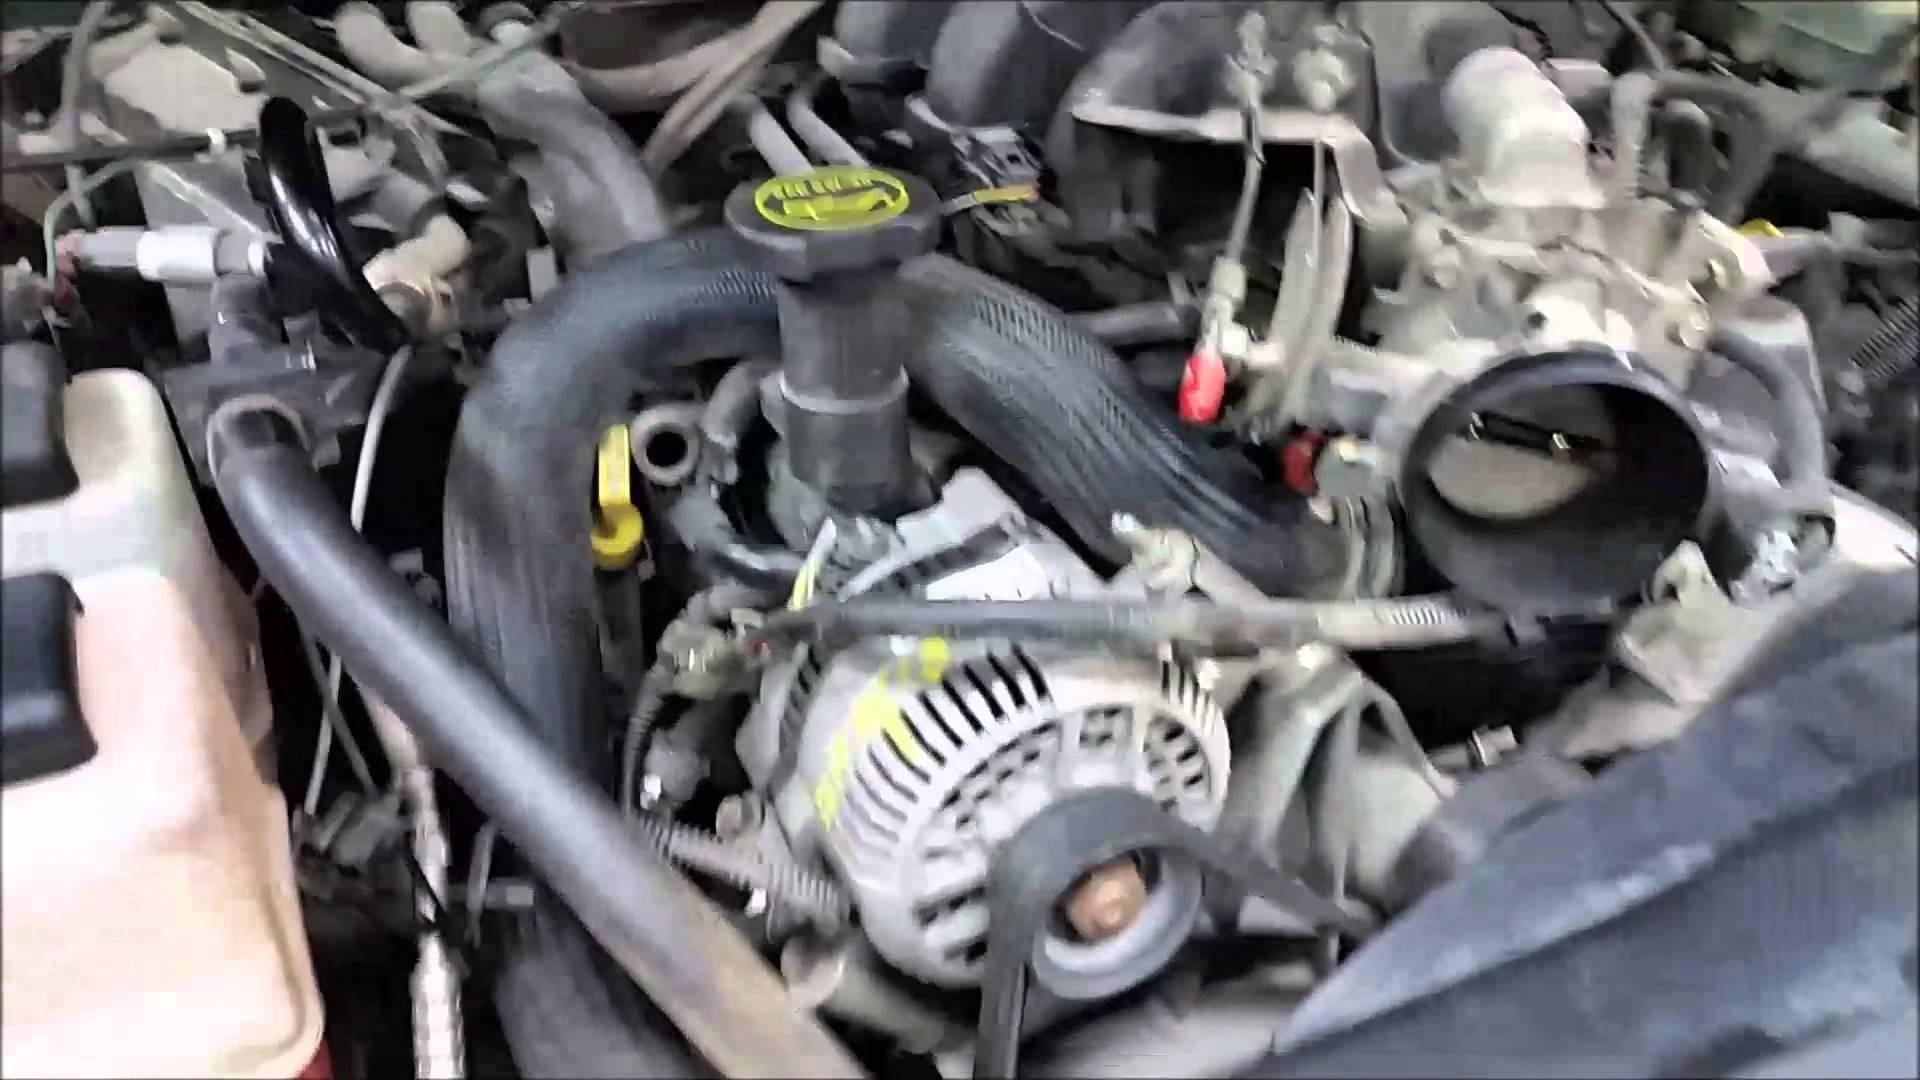 4 0l engine diagram schematic diagram1999 ford 4 6 engine diagram schema  wiring diagram toyota 4